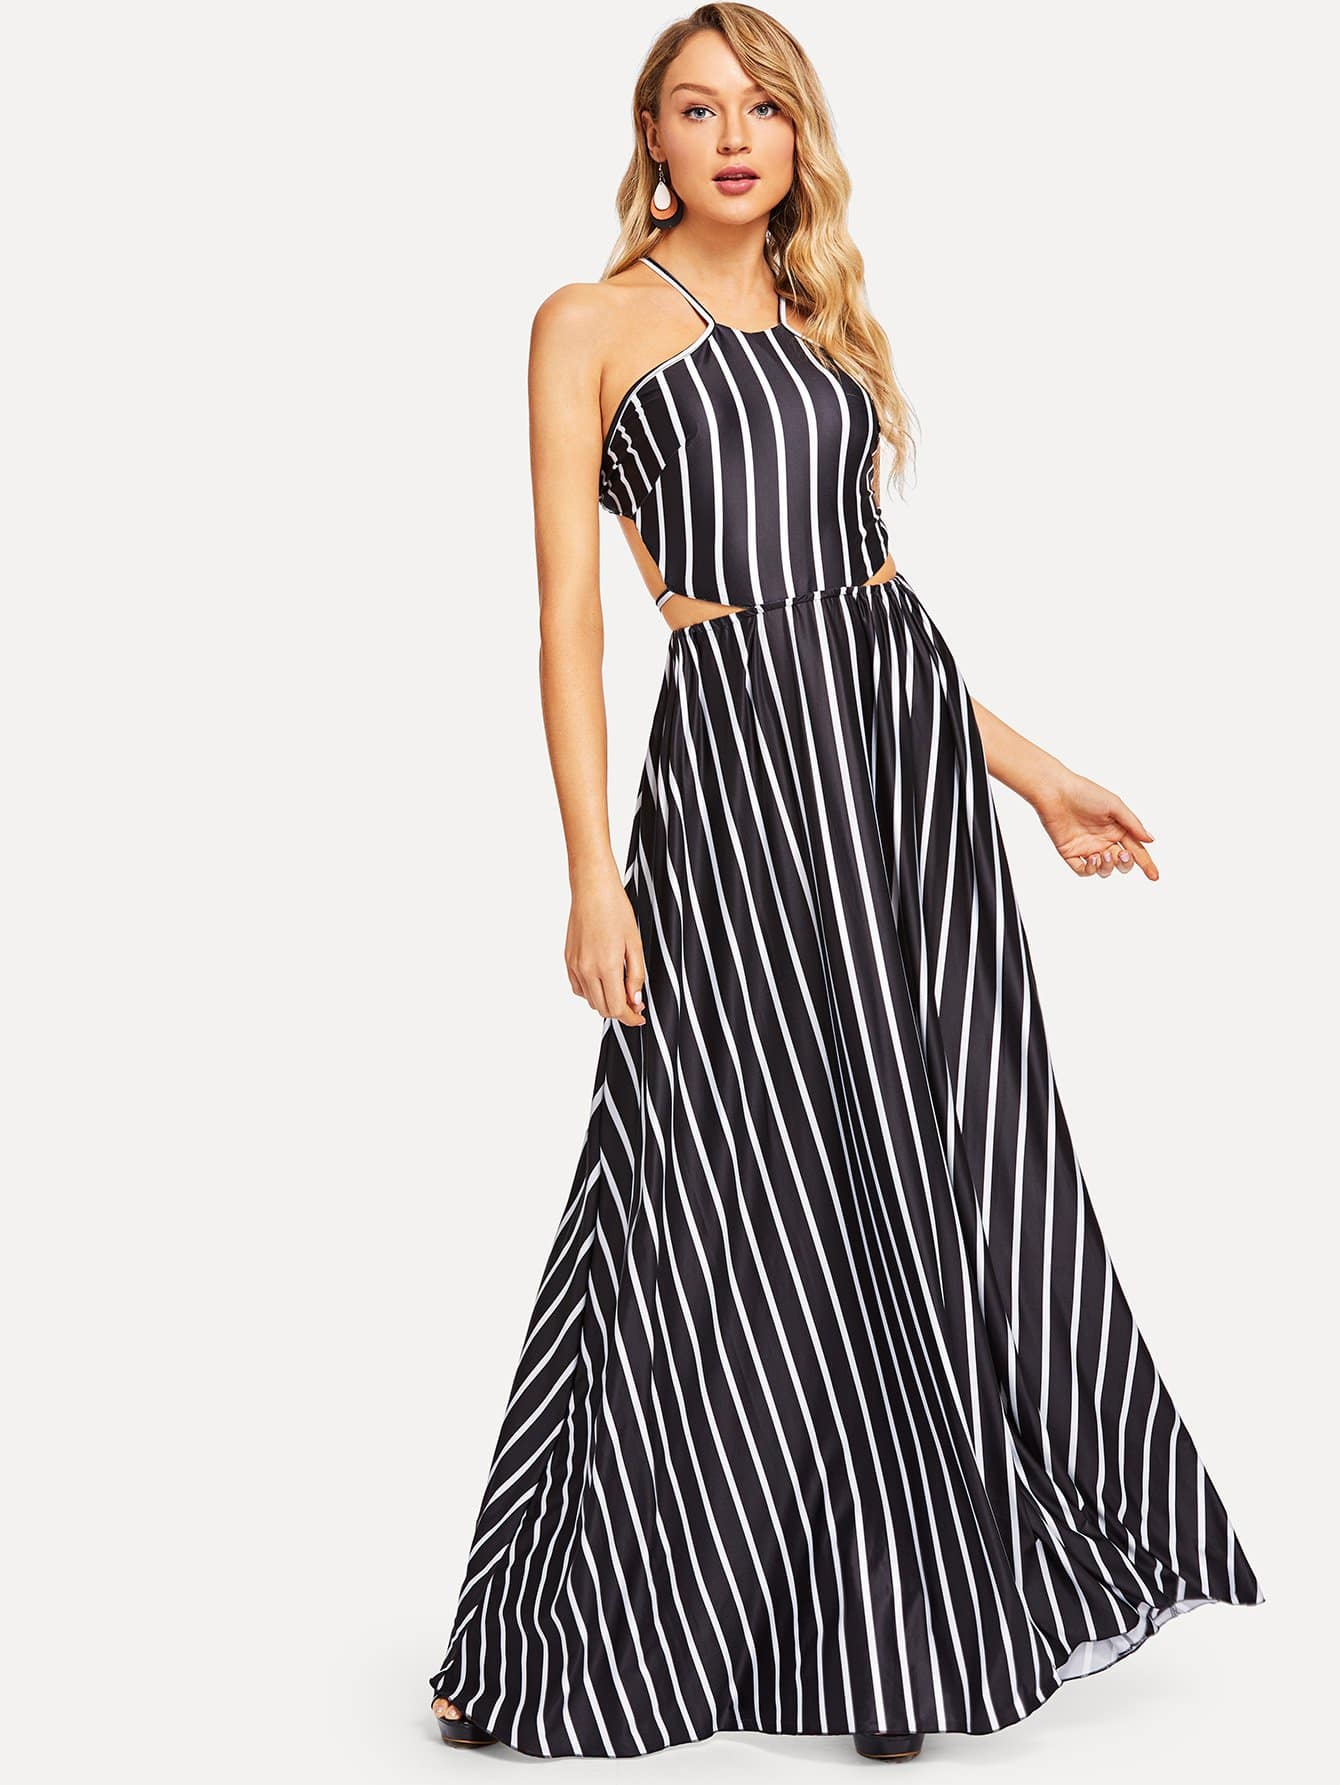 Cutout Halter Neck Striped Dress halter cutout plunge neck monokini